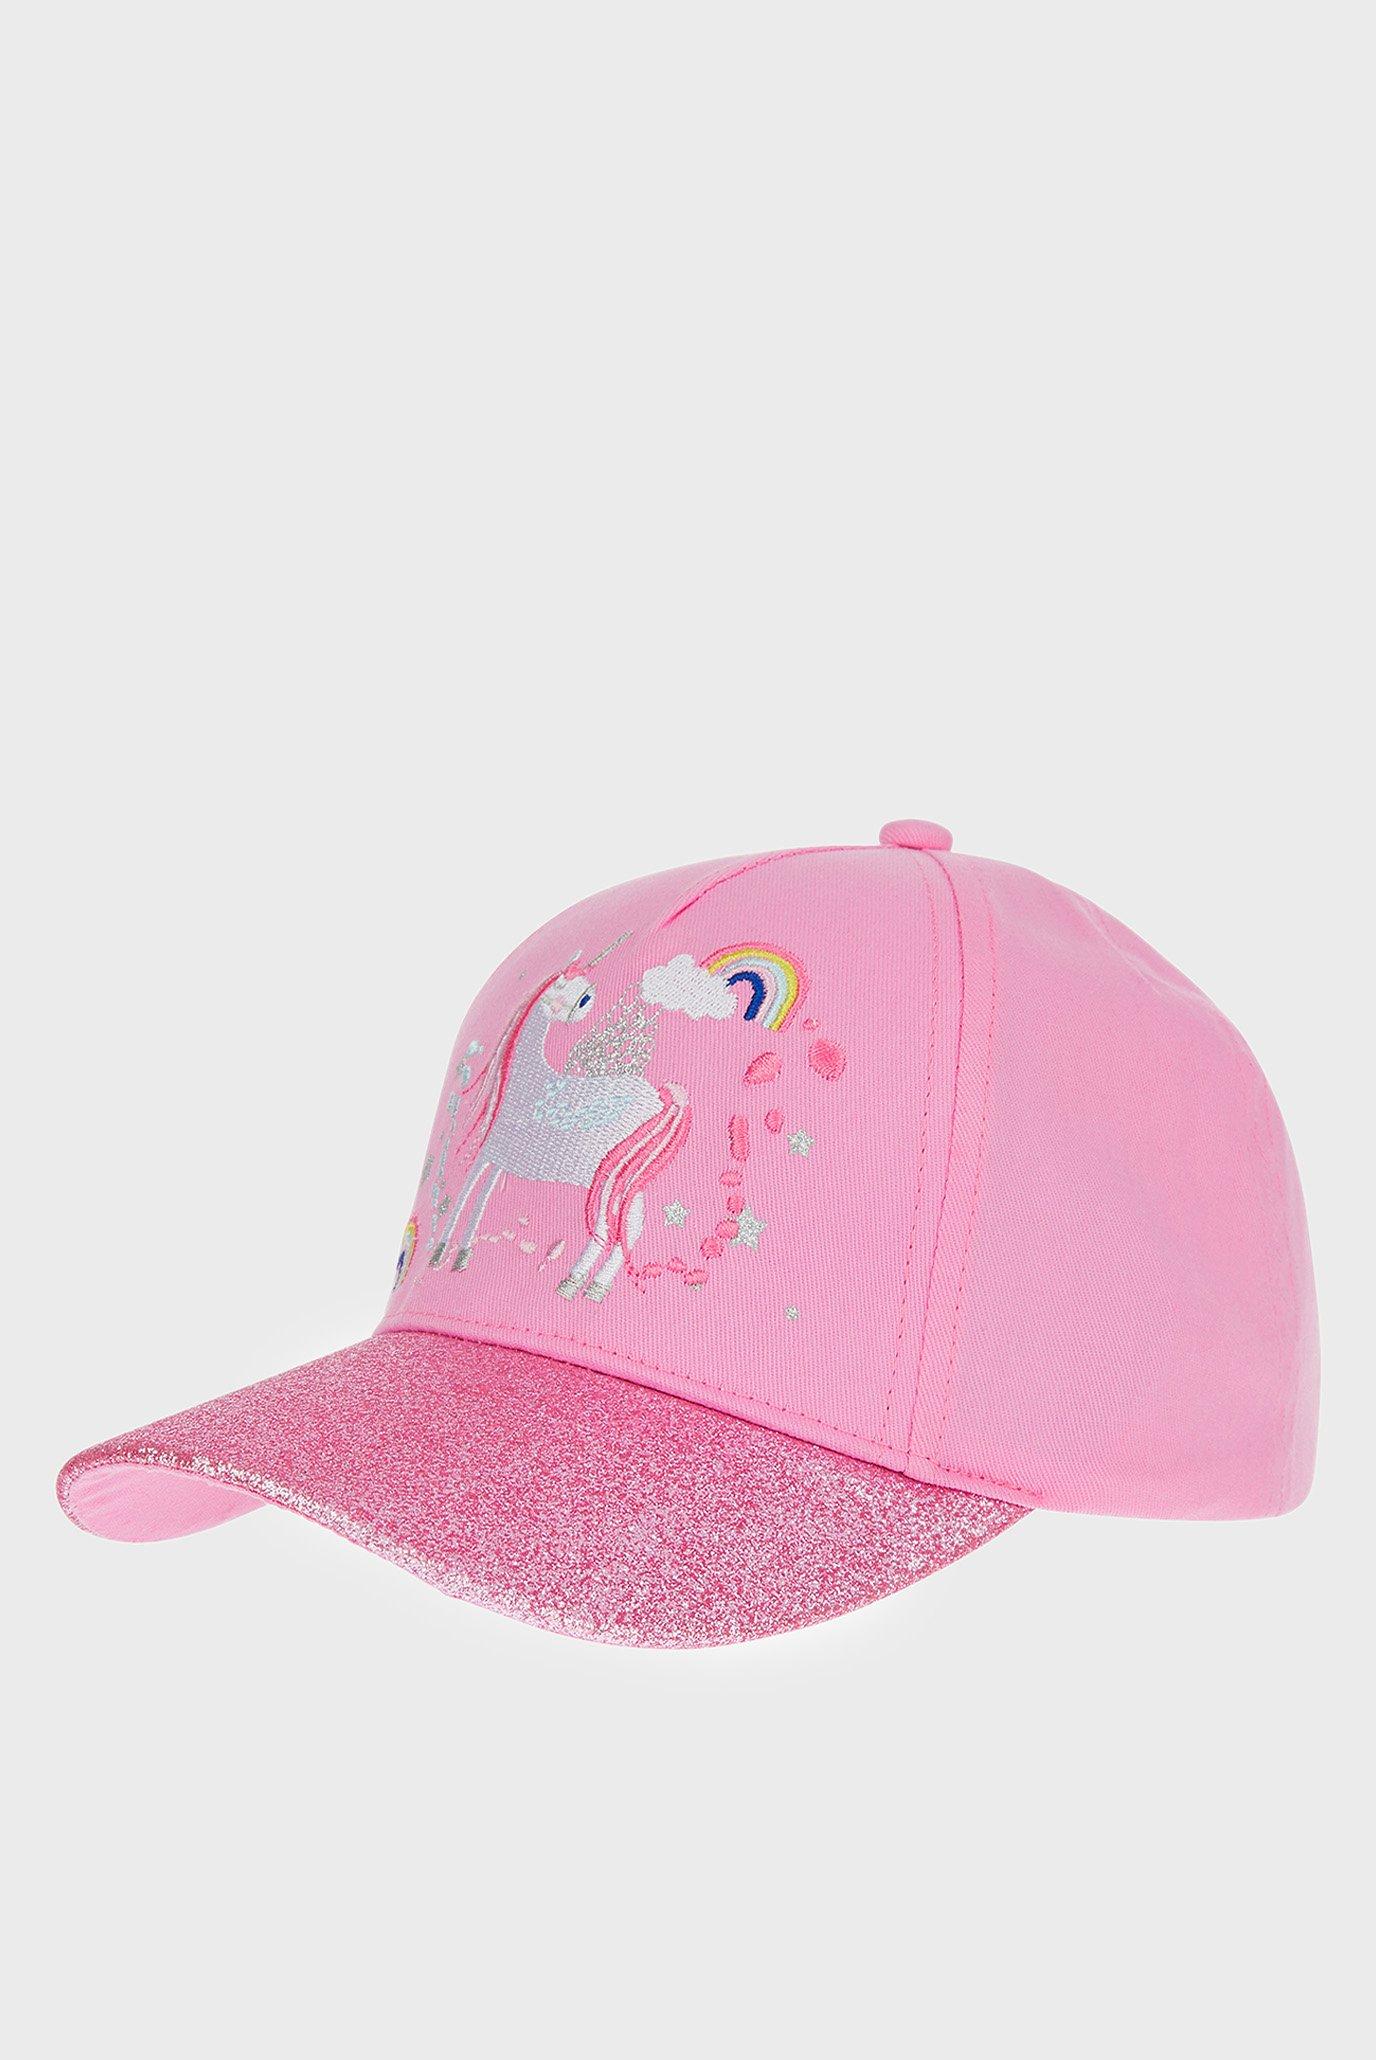 Детская розовая кепка UNICORN Accessorize